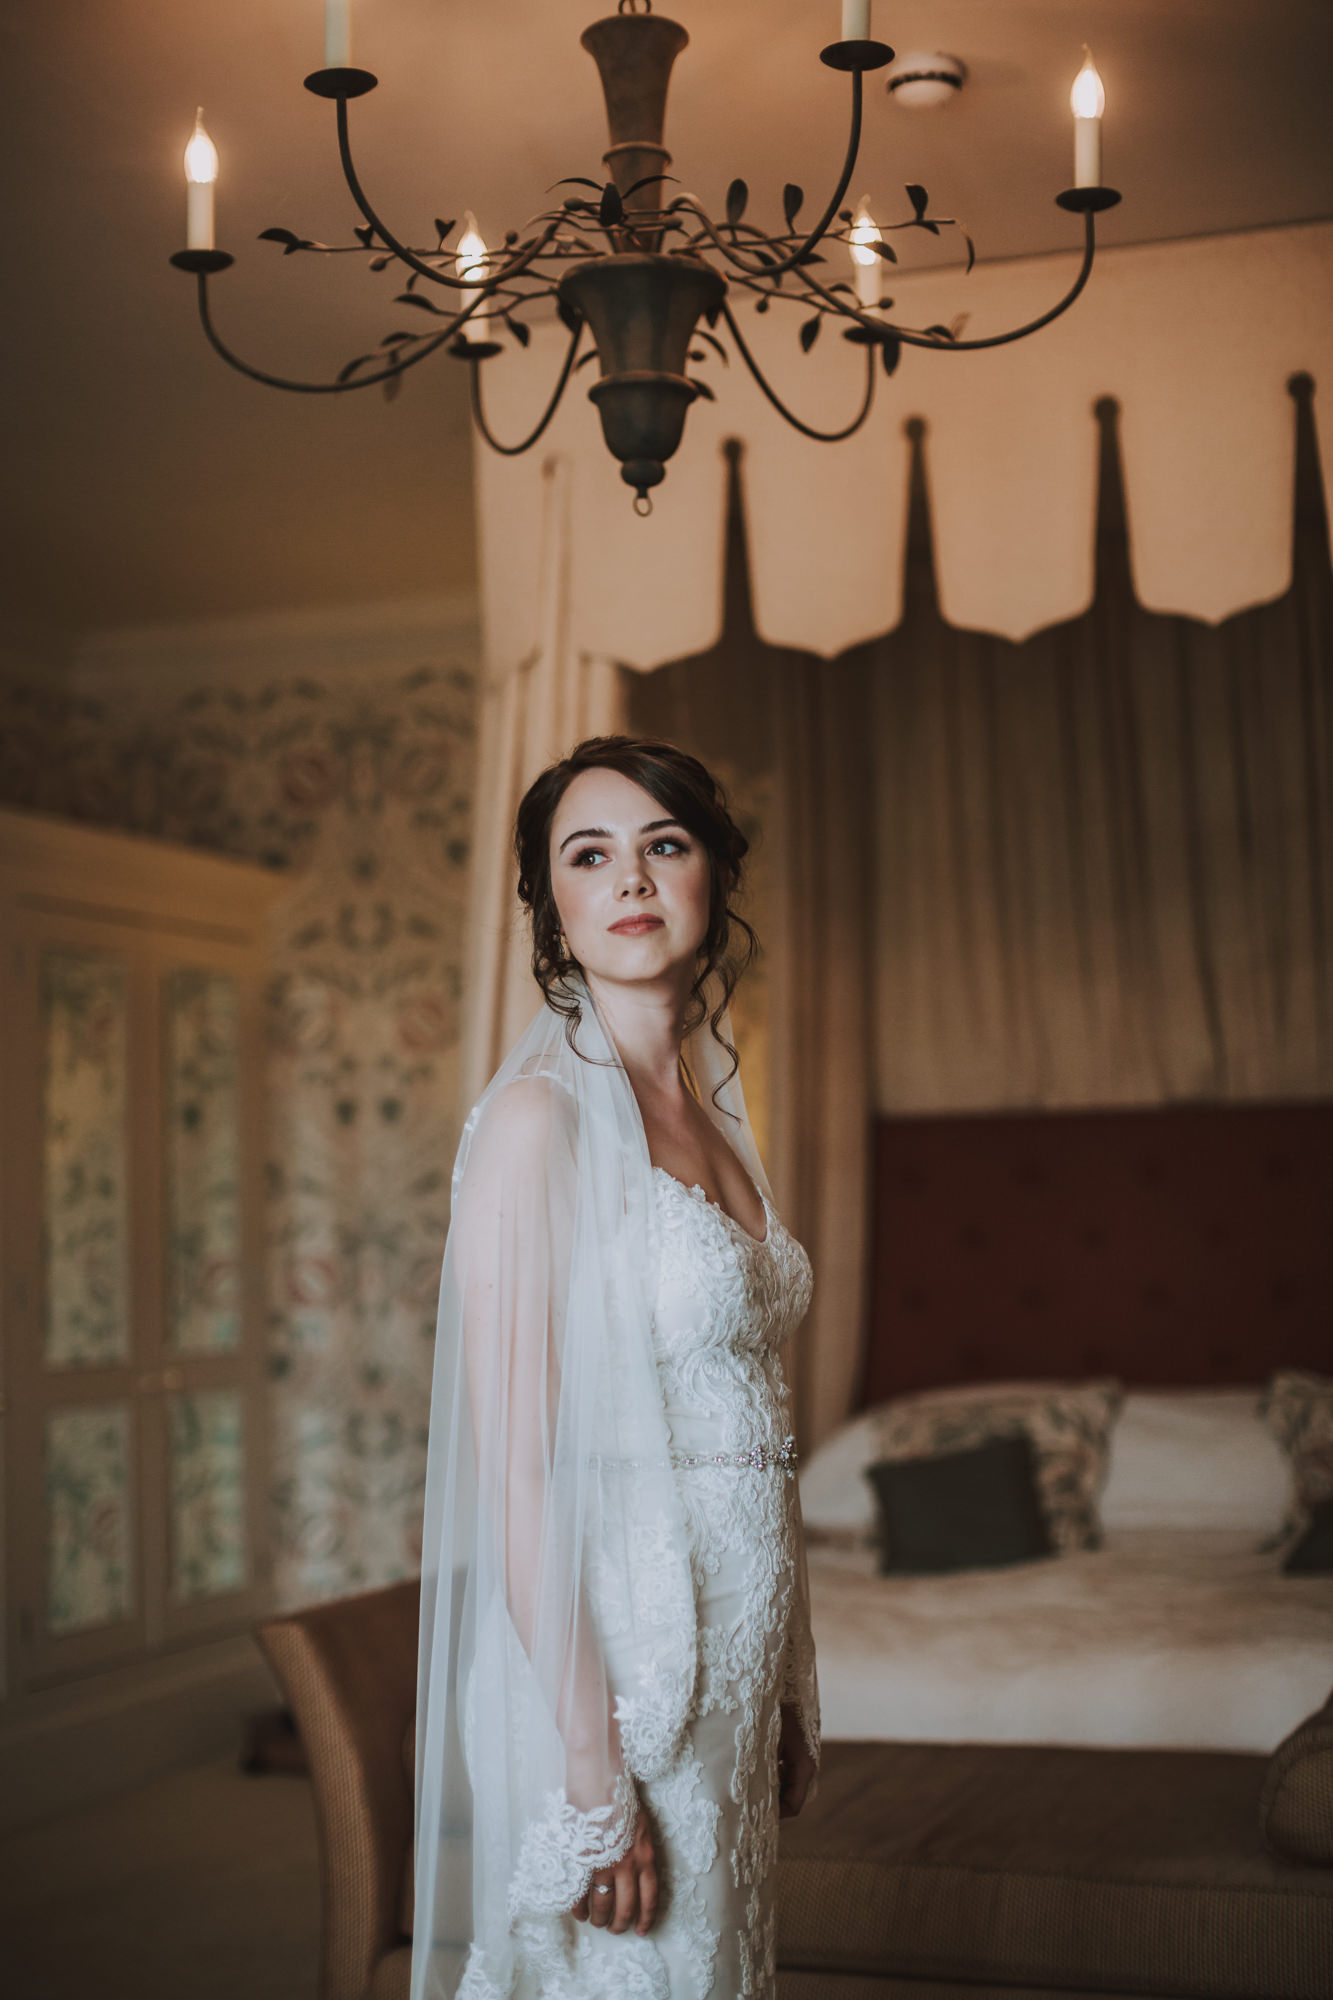 hodsock priory wedding photographers blog30.jpg